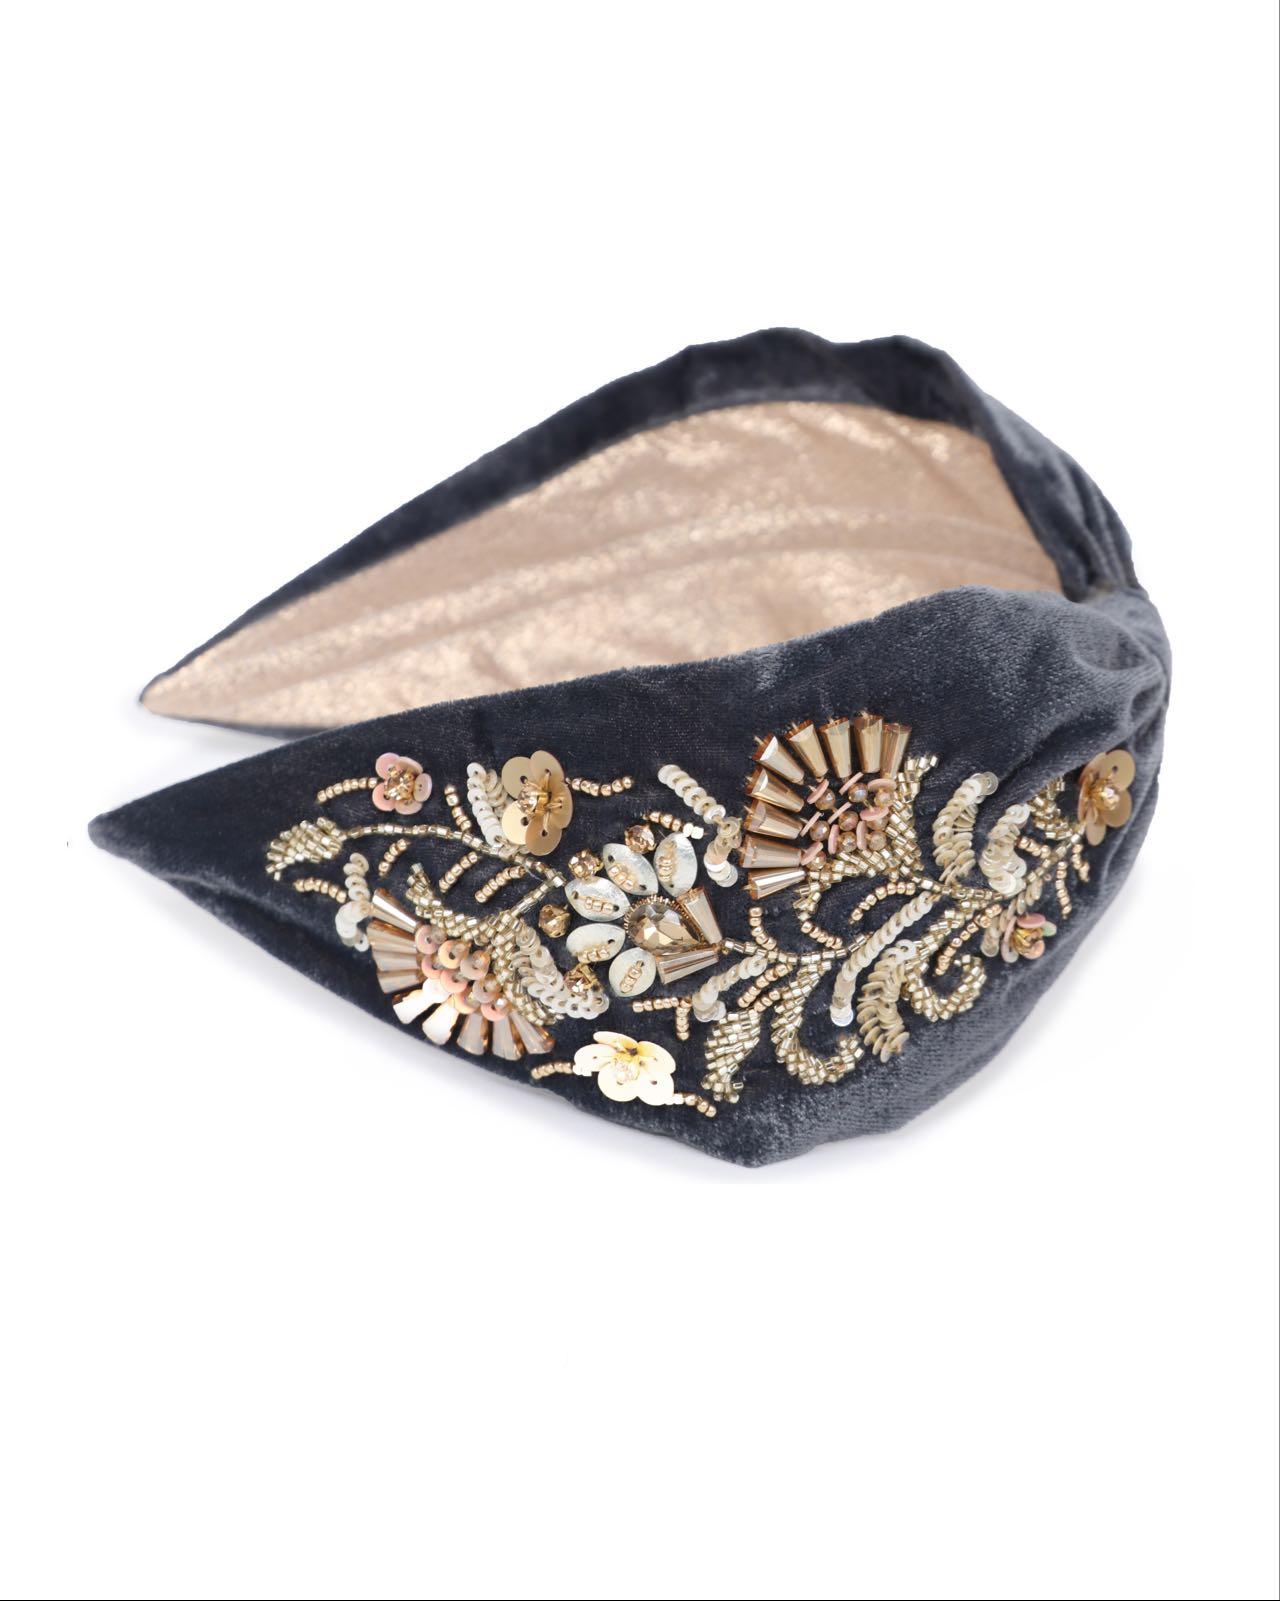 Powder charcoal velvet Headband with gold embellishments